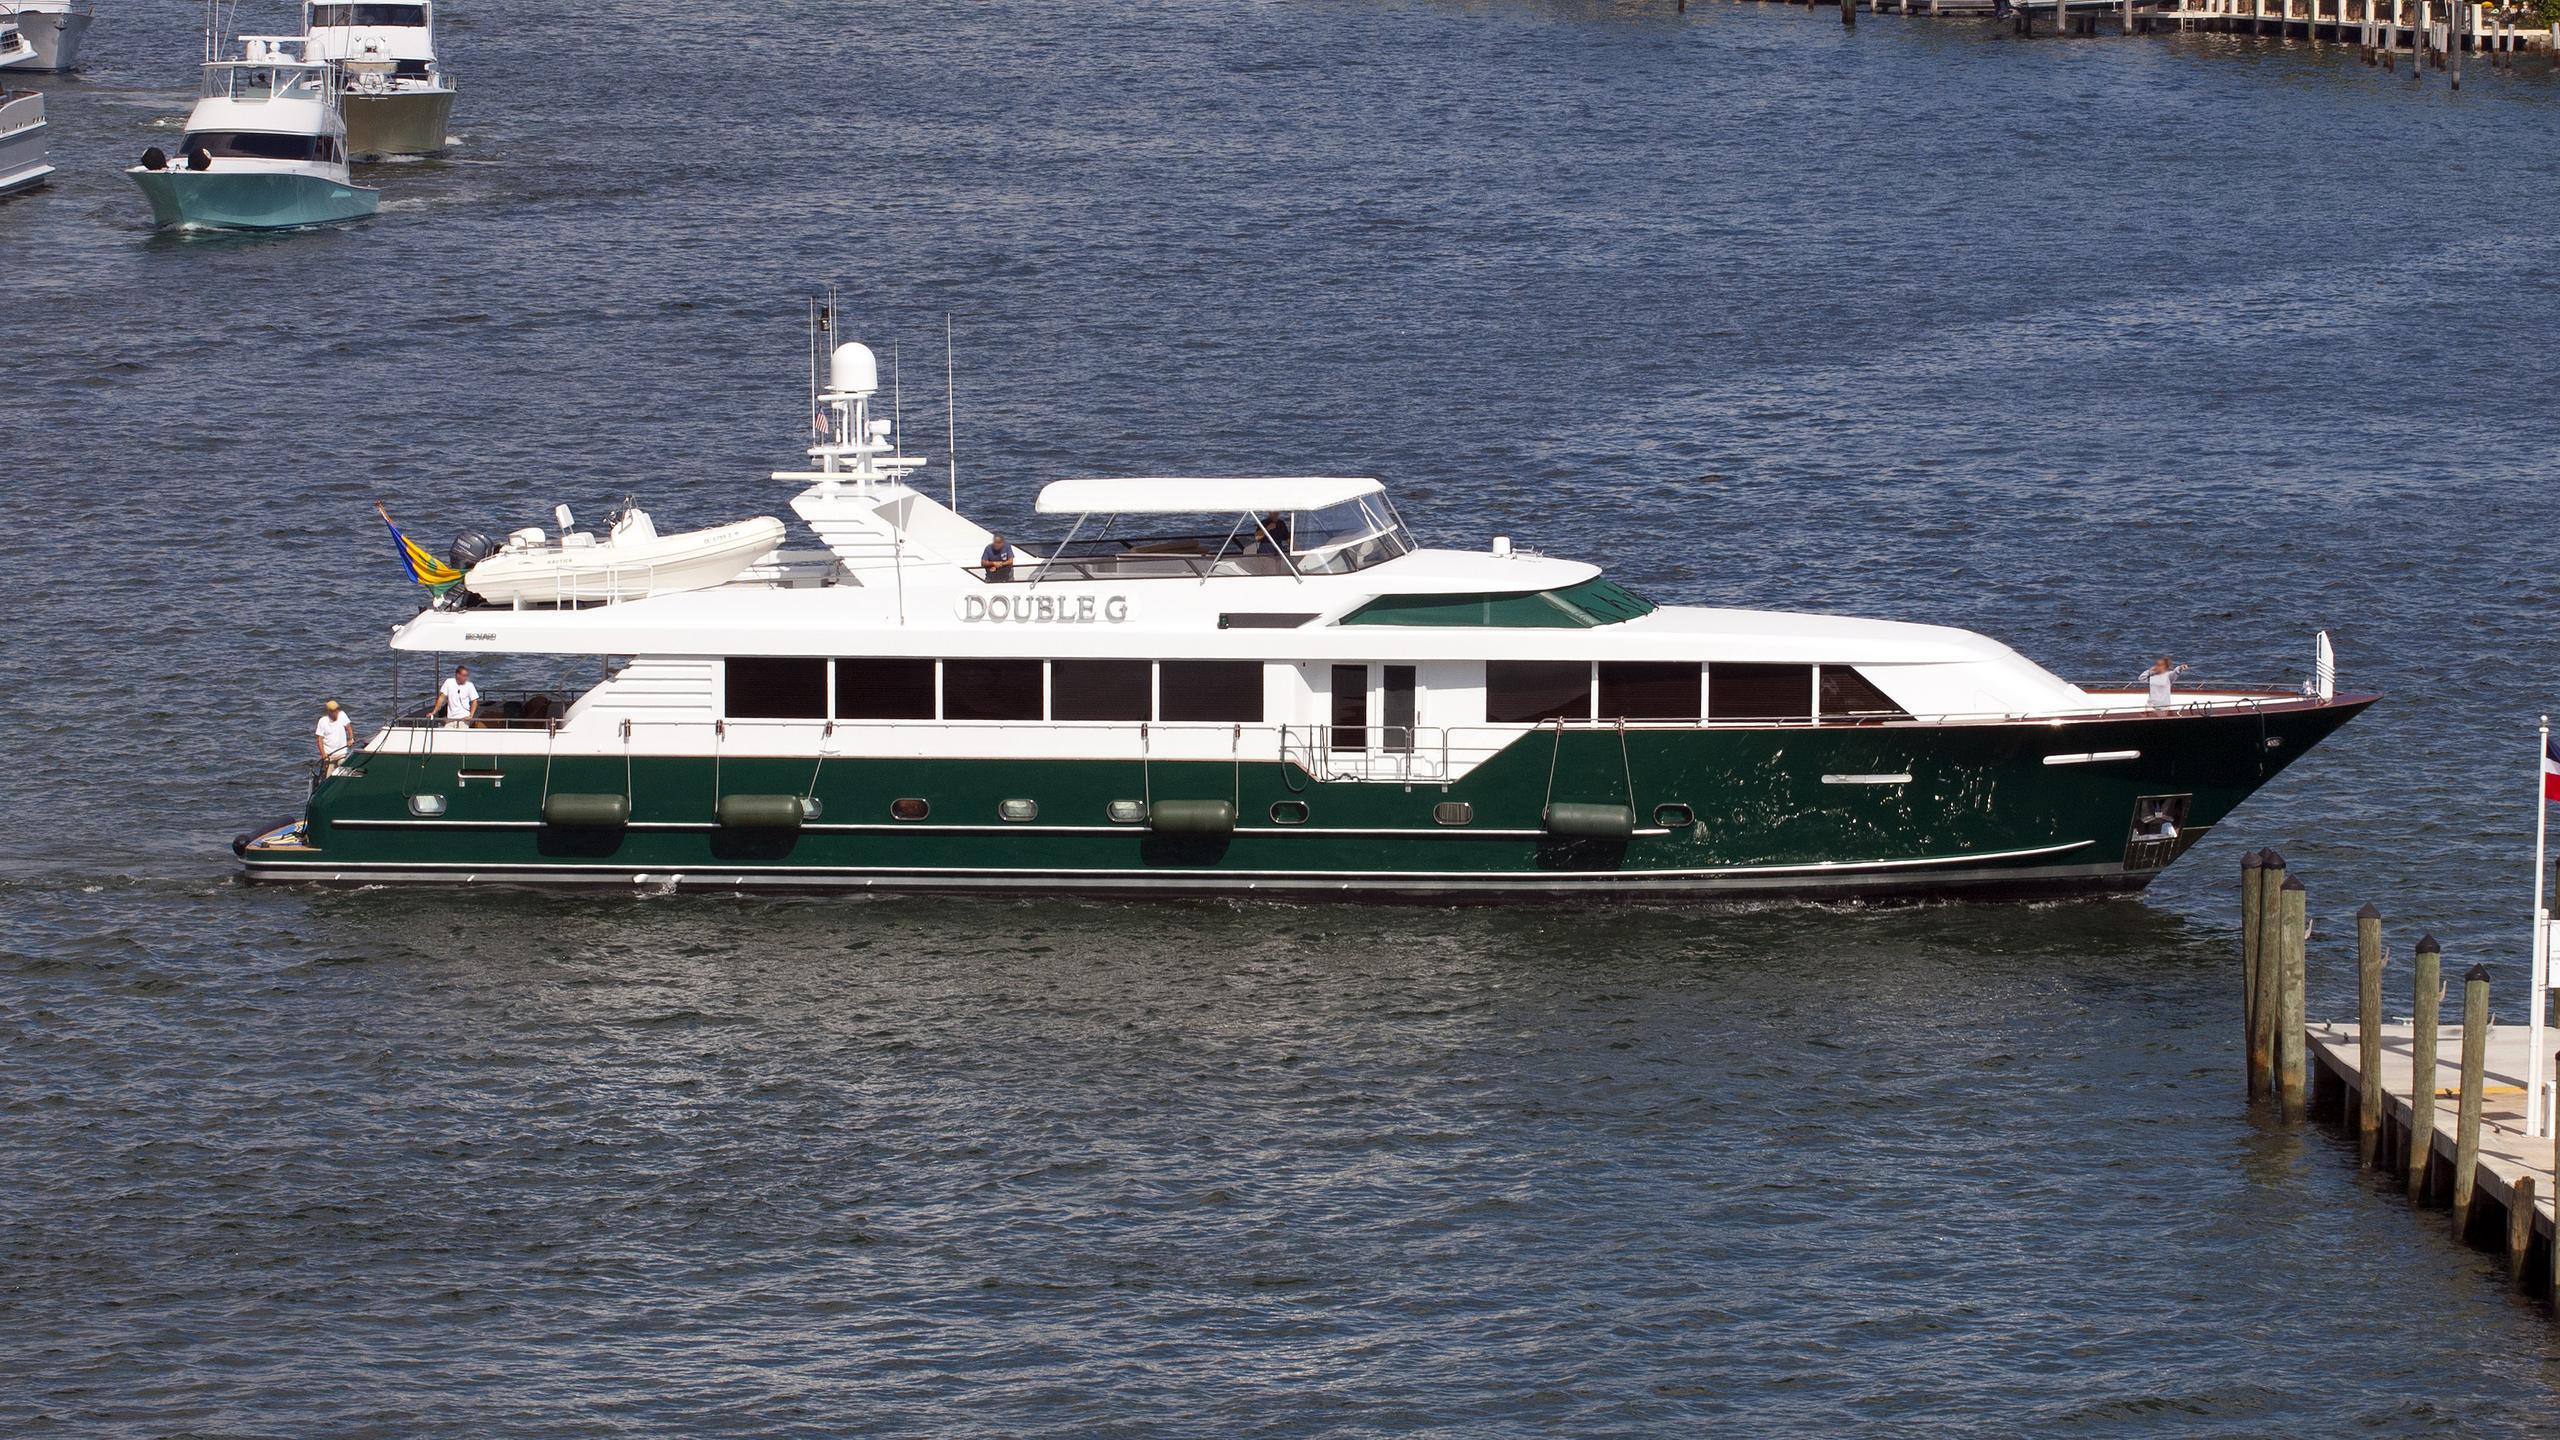 double-g-motor-yacht-broward-20000-36m-profile